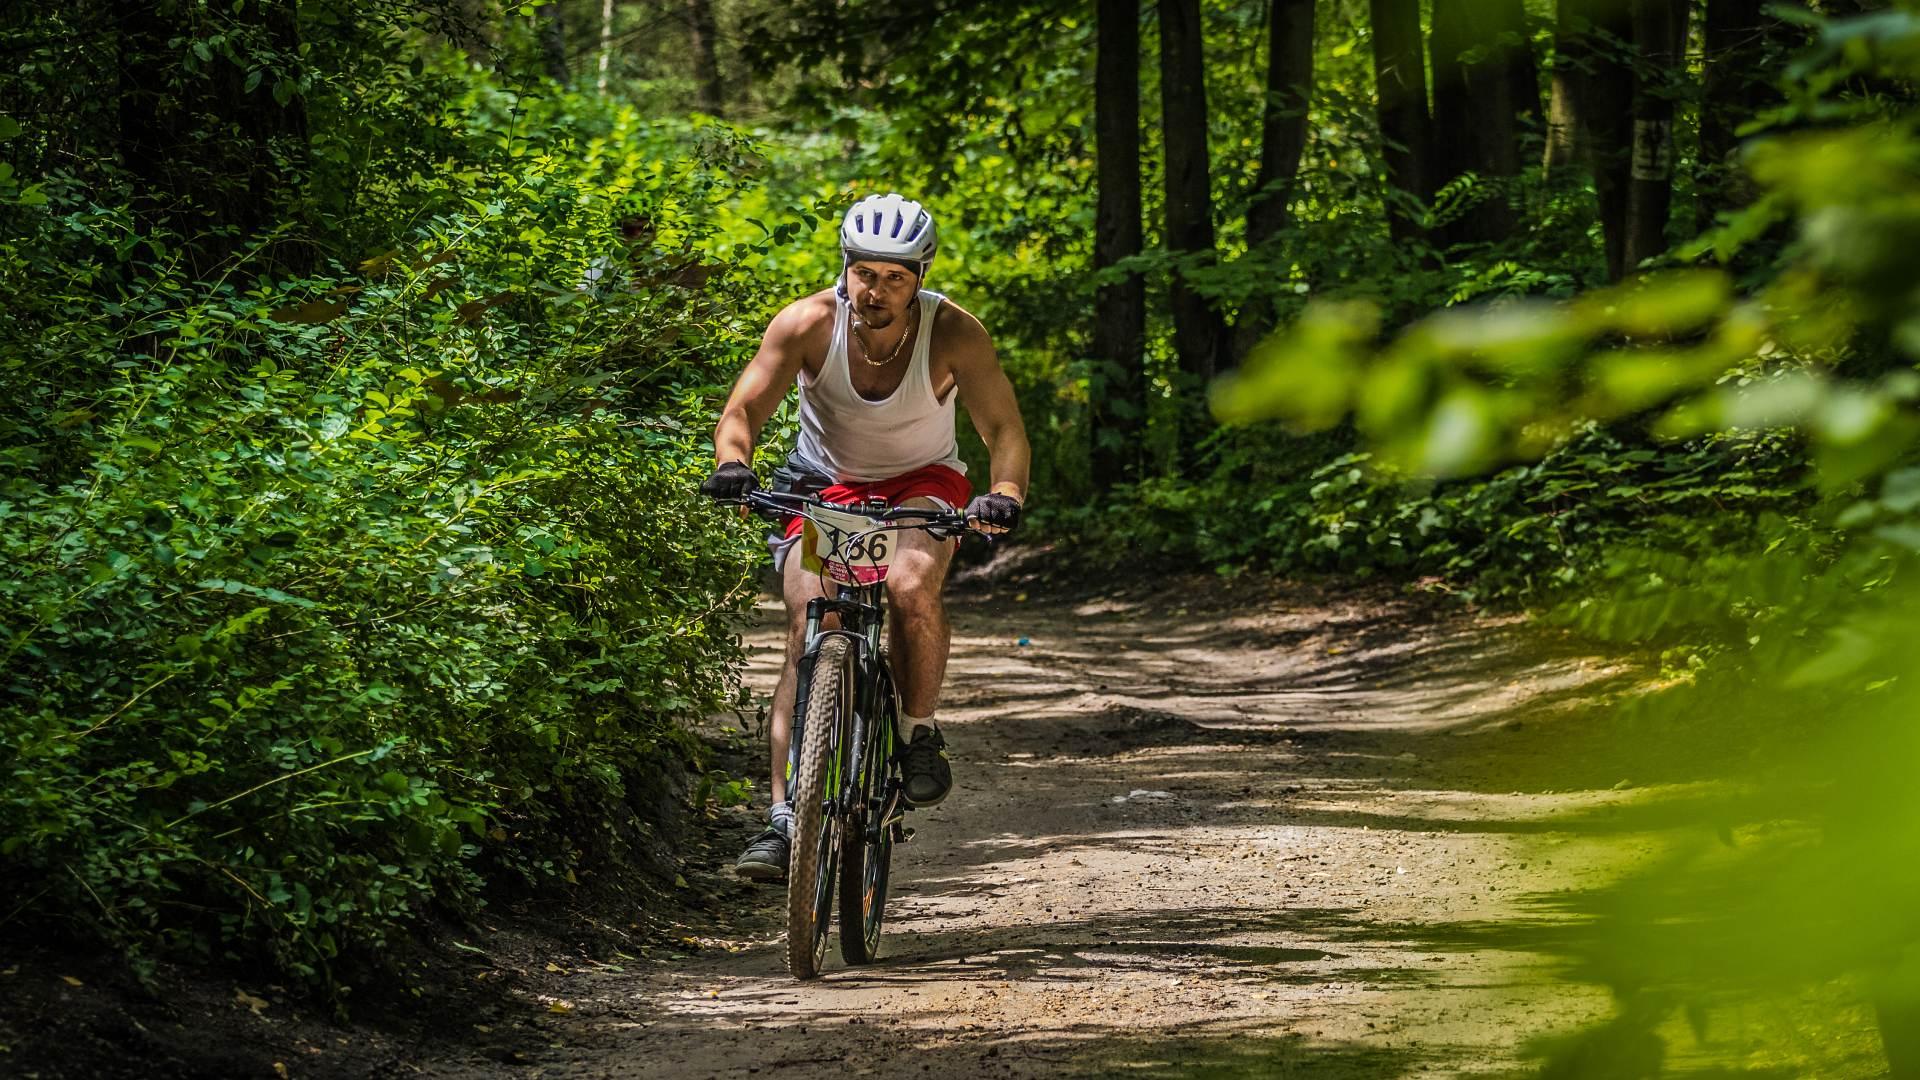 wyscig-rowerow-gorskich-0106